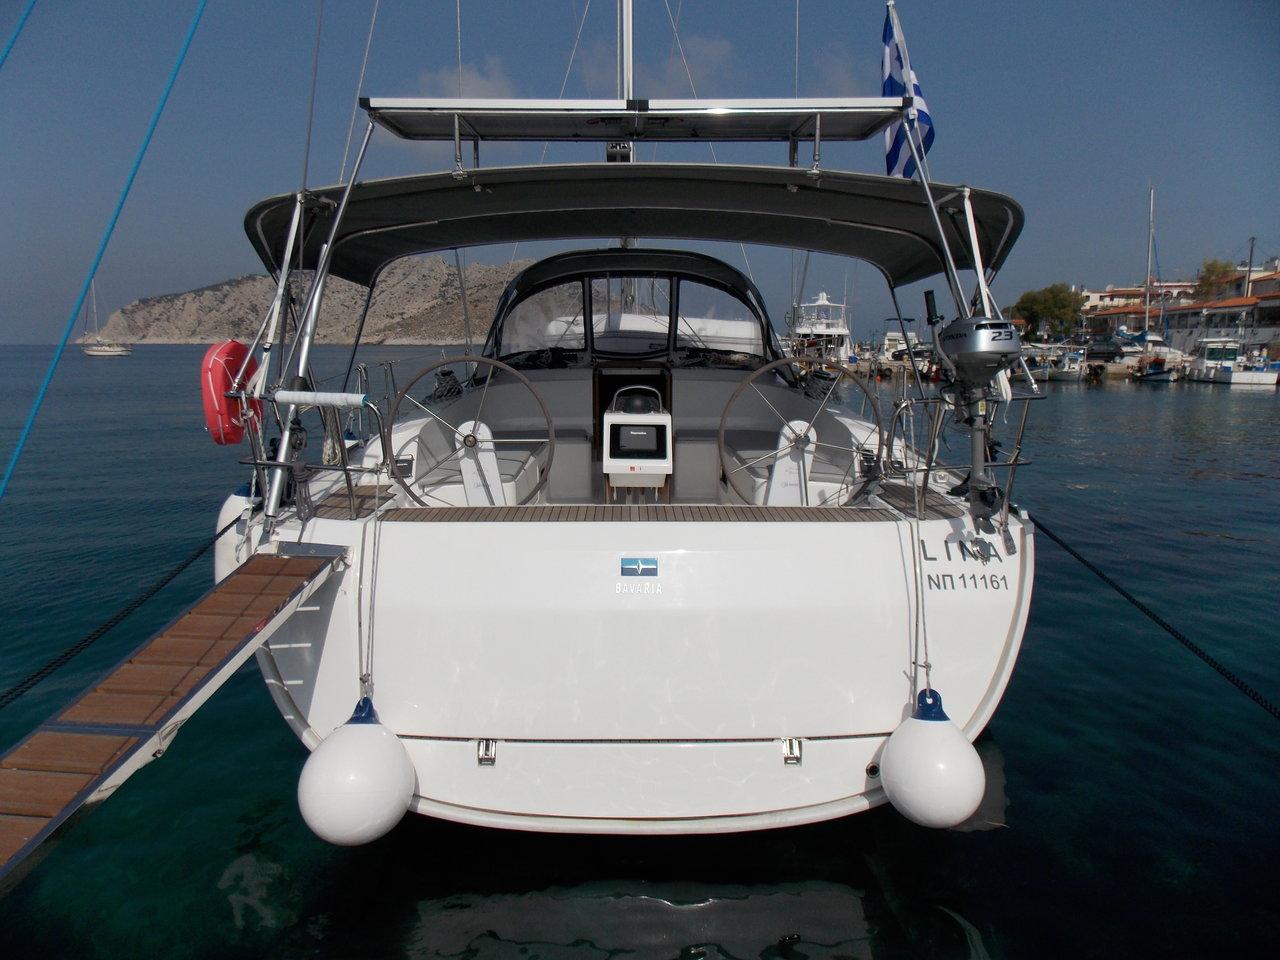 Bavaria Cruiser 46 - 4 cab. - Lina